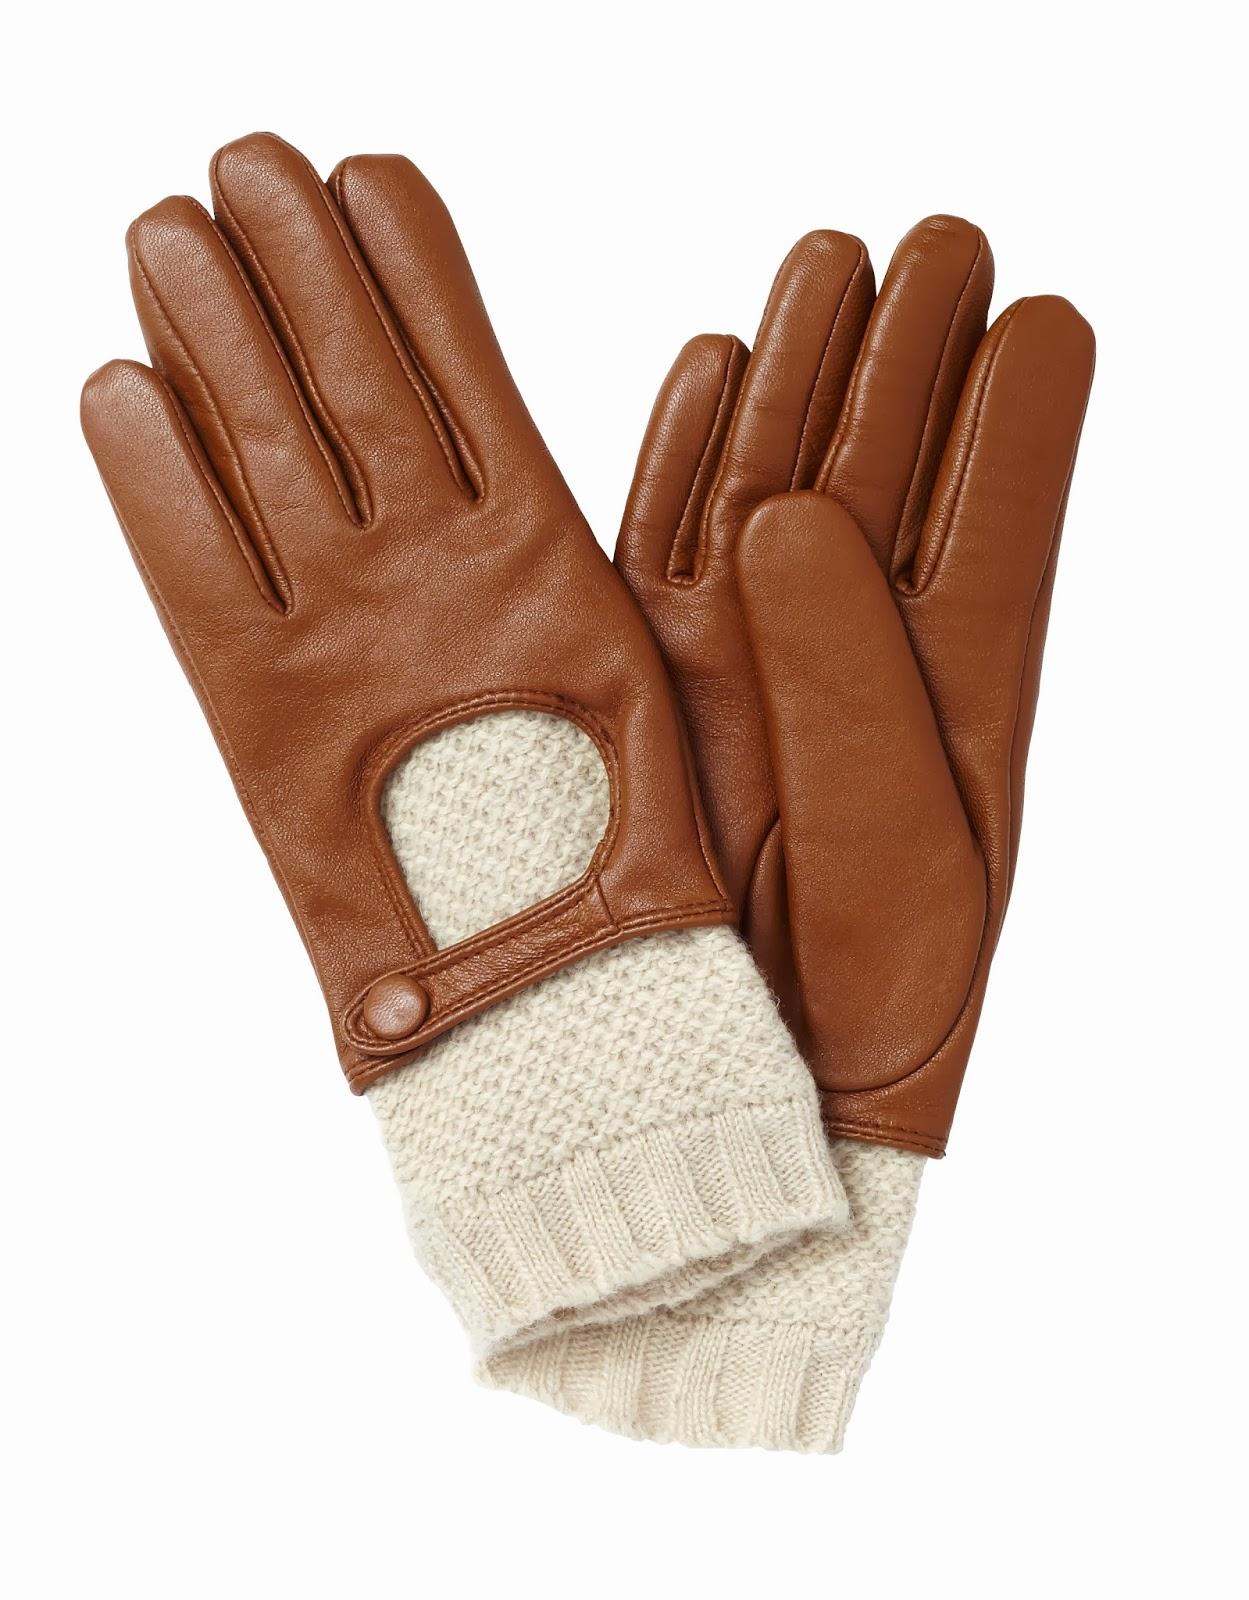 Driving Gloves Knitting Pattern : Esther y su Mundo: Accesorize, Nombre propio